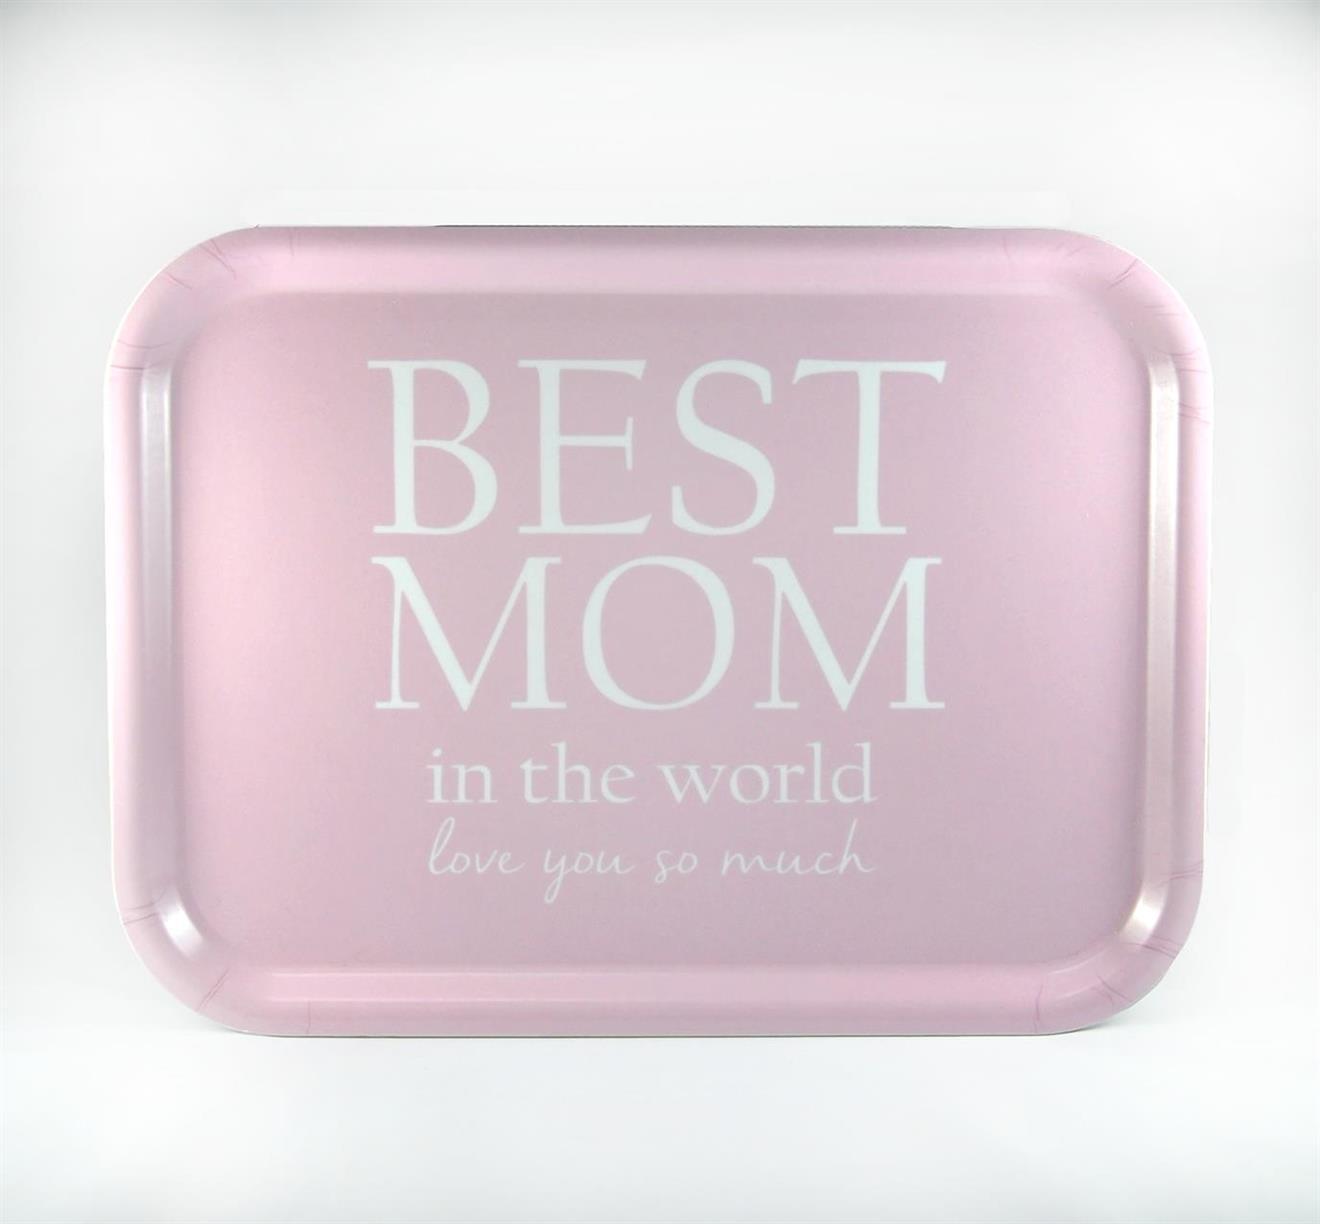 Bricka 27x20 cm, Best Mom, rosa/vit text